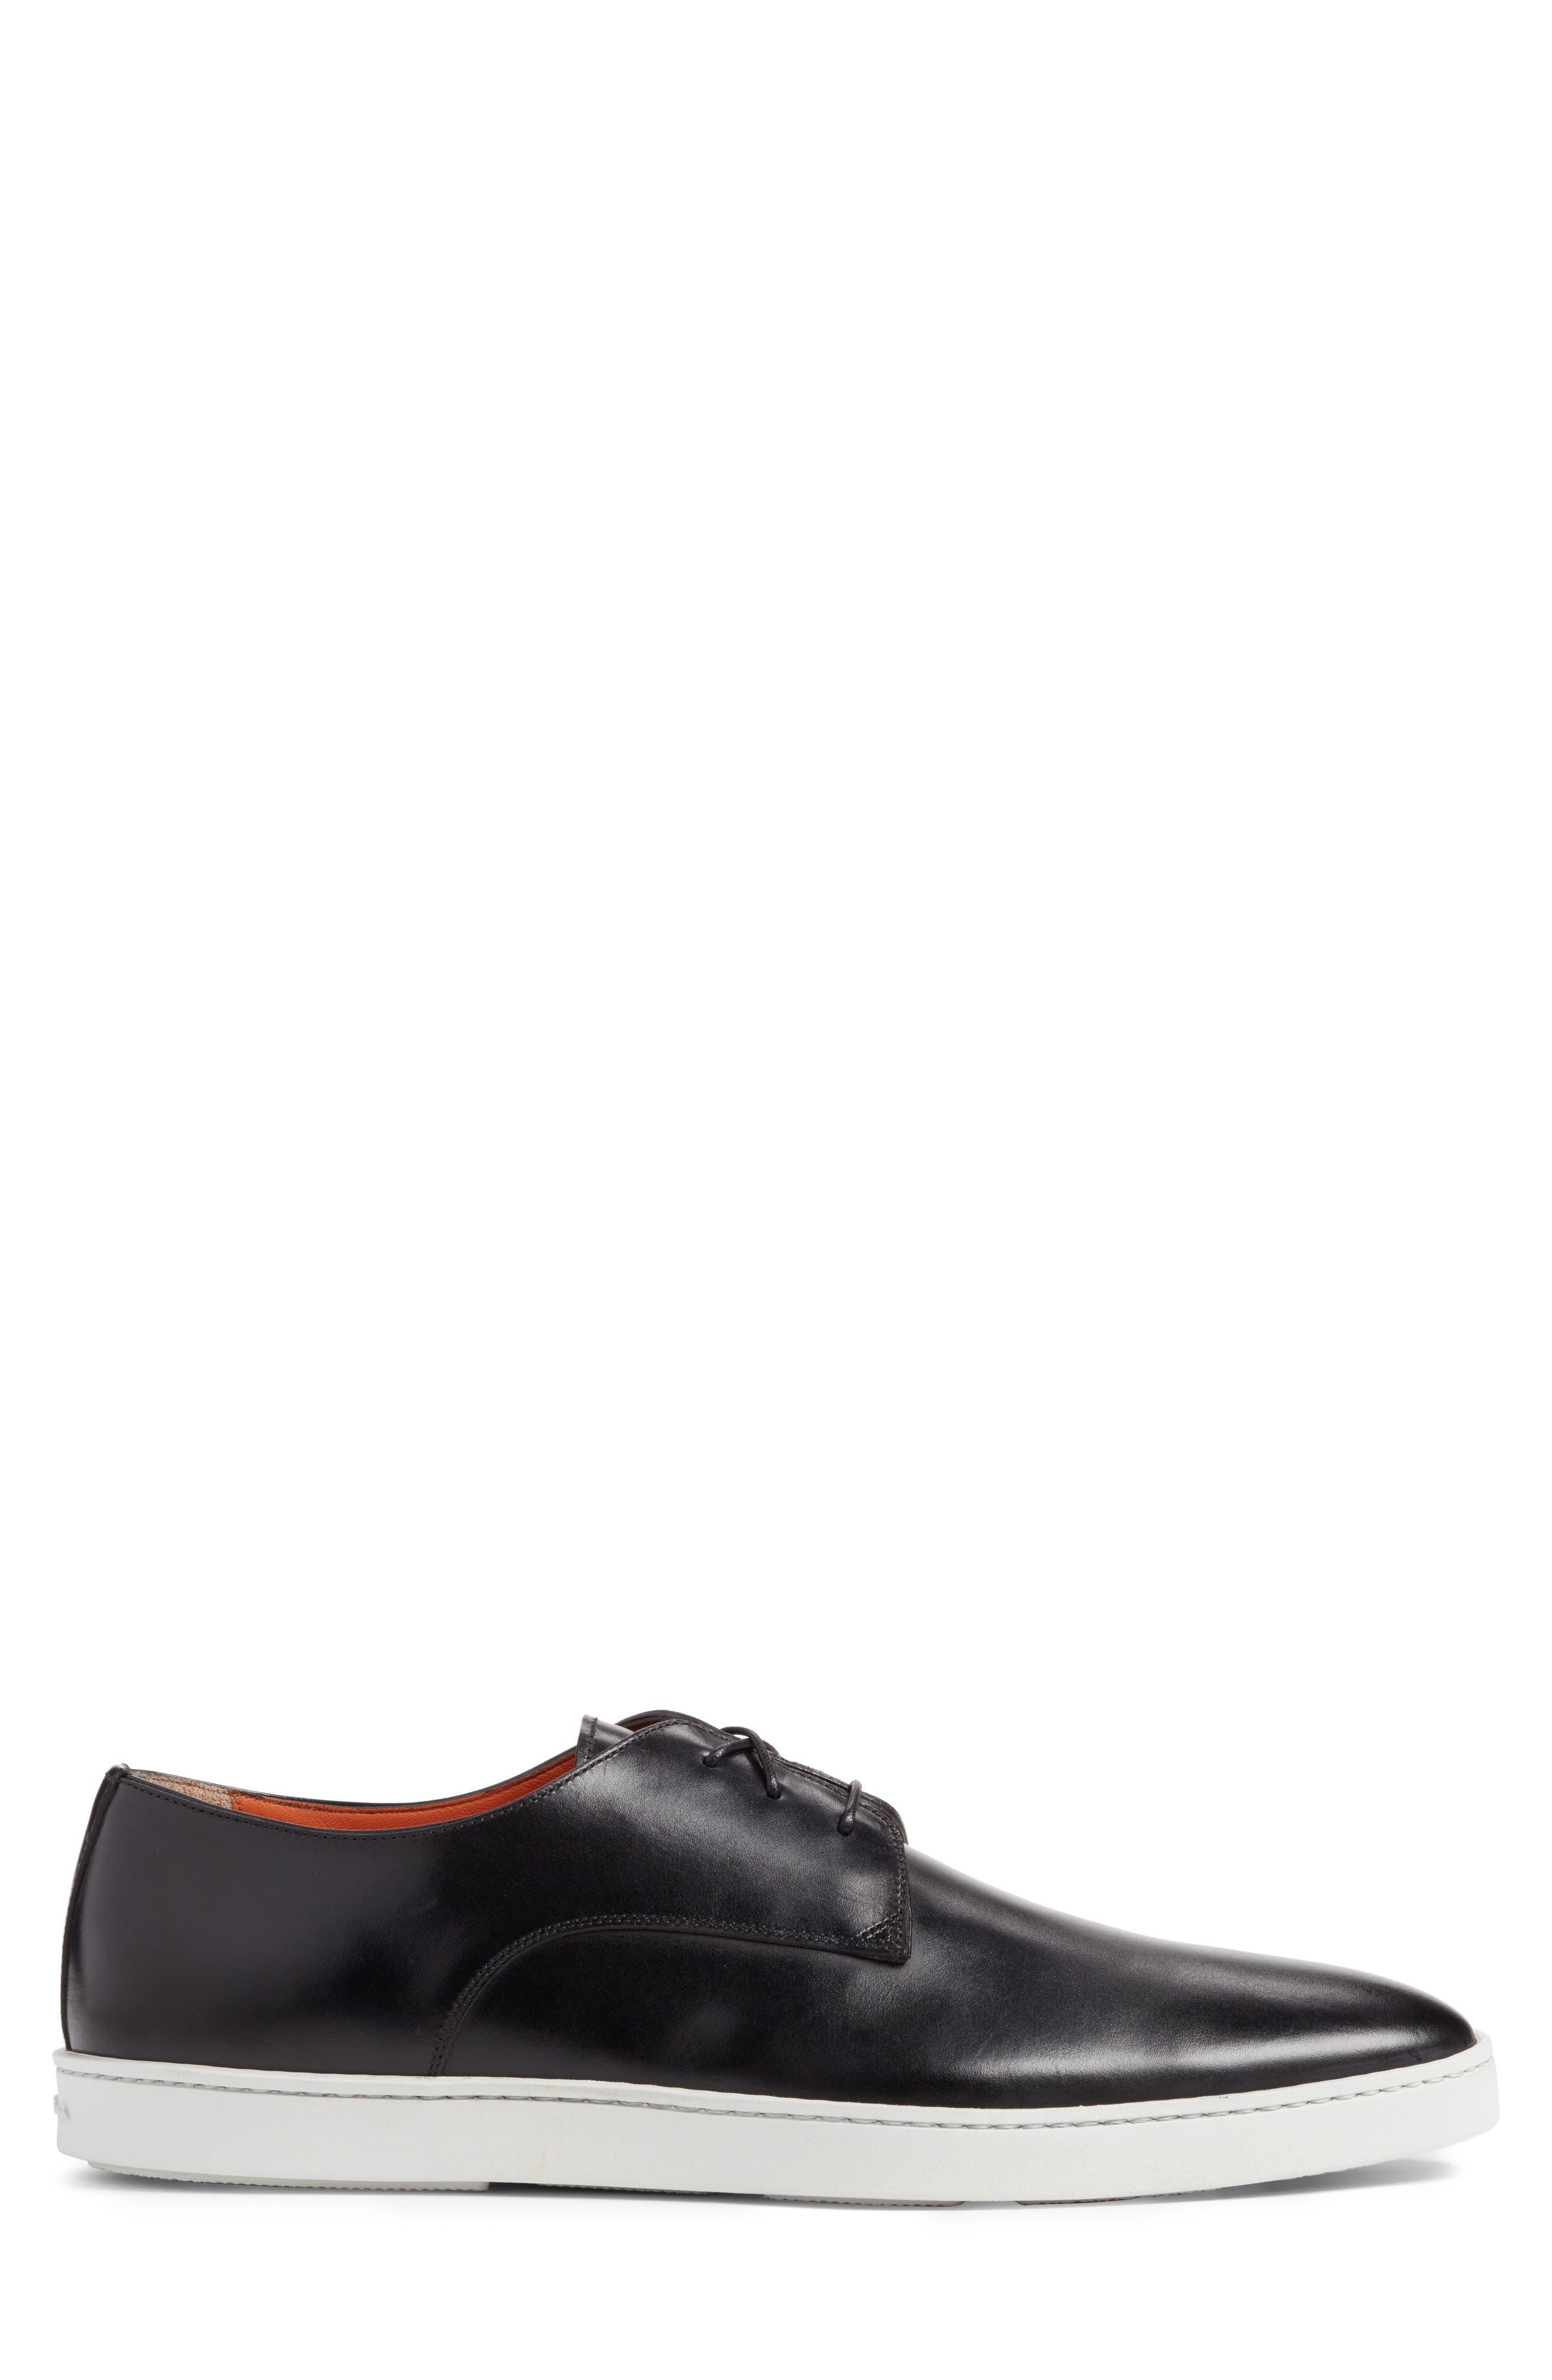 Doyle Sneaker,                             Alternate thumbnail 3, color,                             BLACK LEATHER